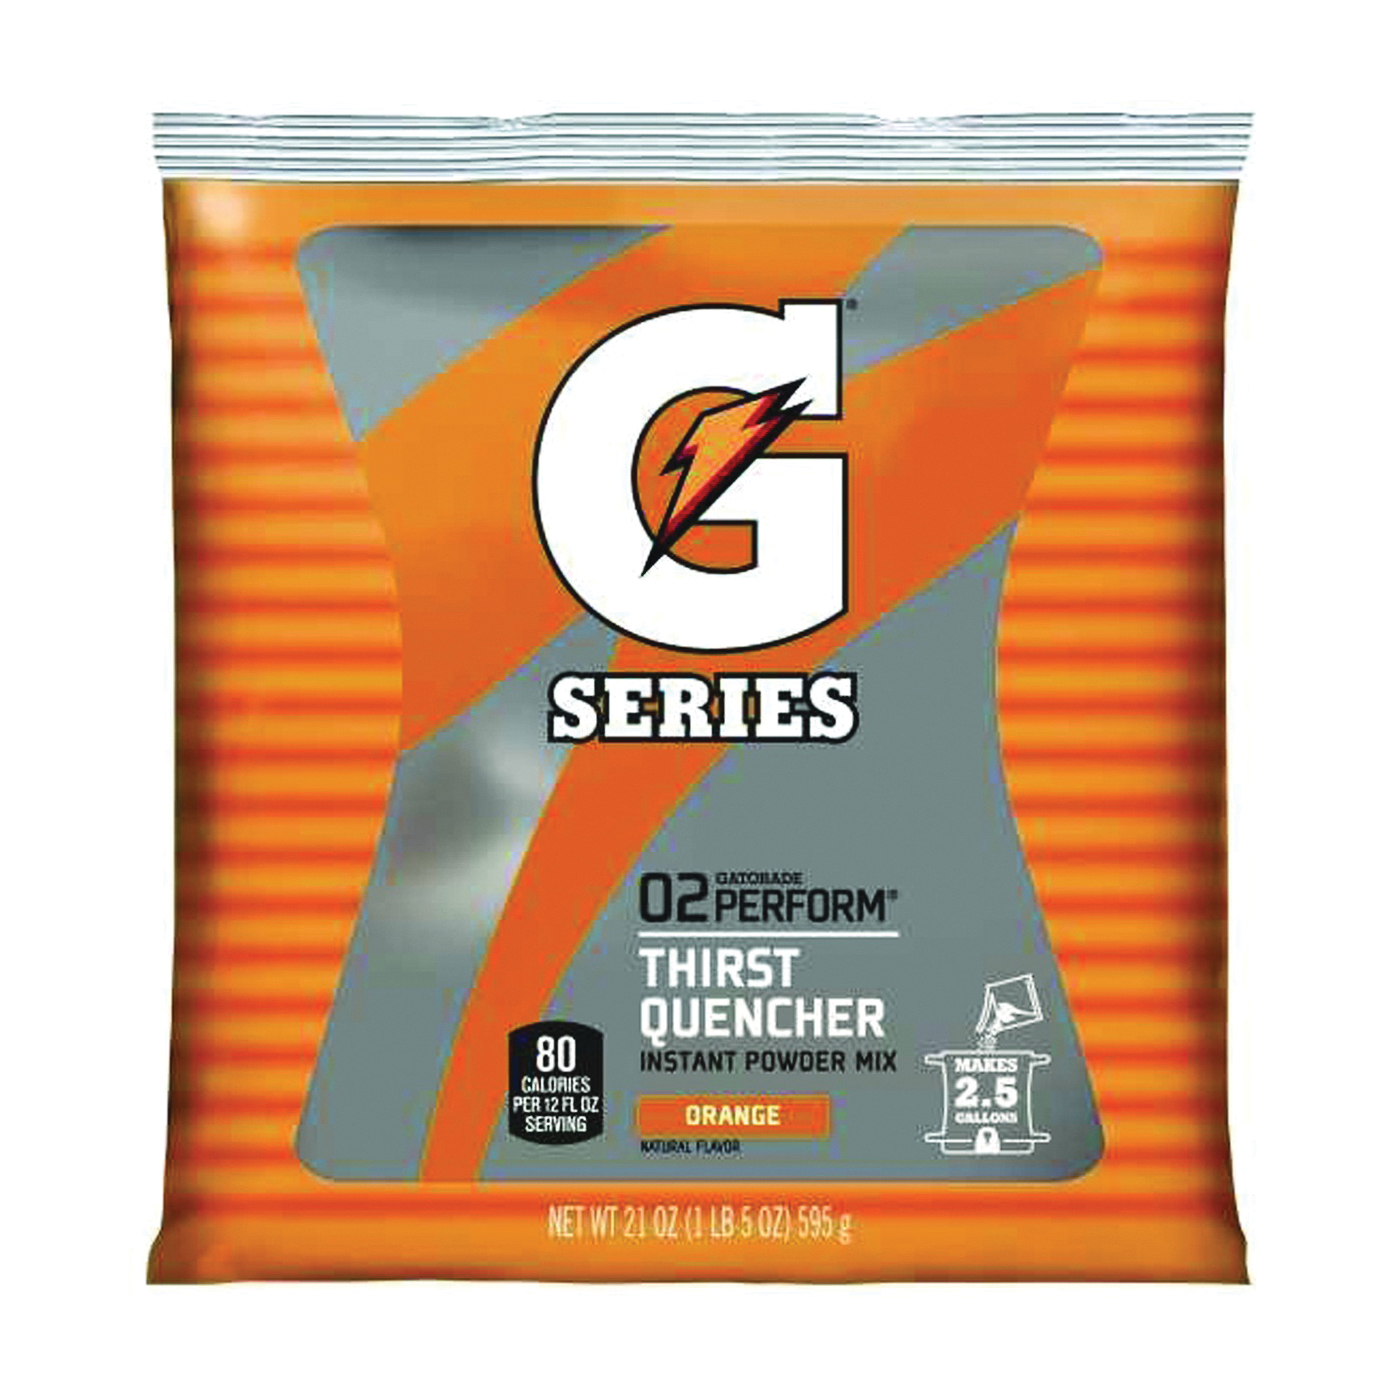 Picture of Gatorade G 03970 Thirst Quencher Instant Powder Sports Drink Mix, Powder, Orange Flavor, 21 oz Package, Pack